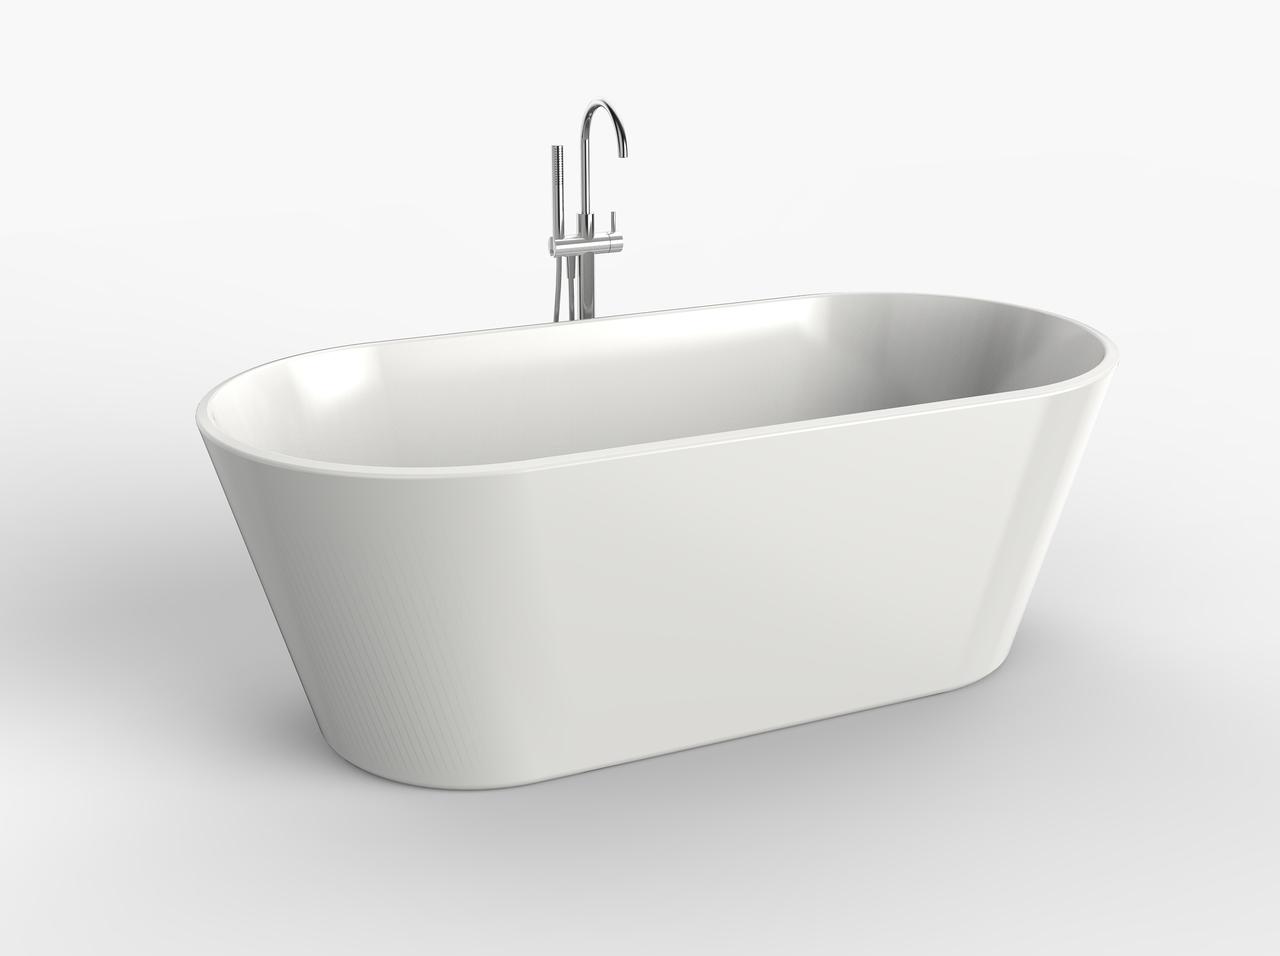 67″ Sutton Deep Oval Freestanding Tub | Platinum Bath